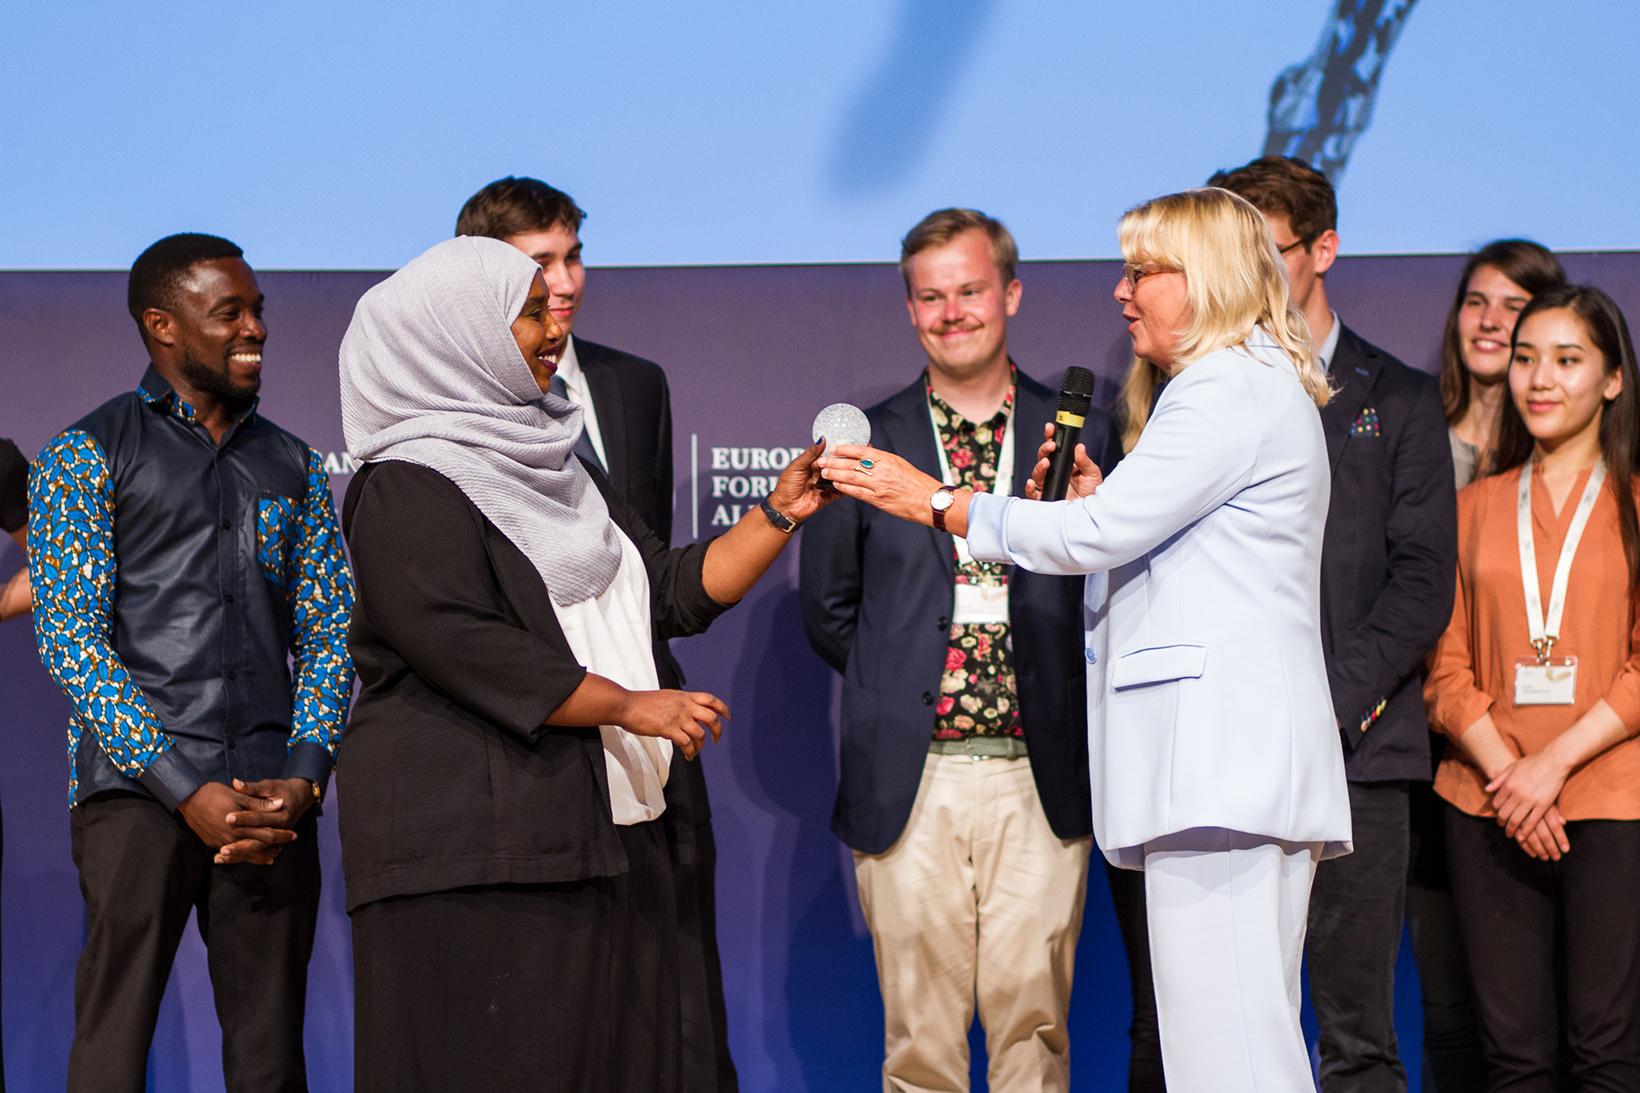 Verleihung des Publikumspreises beim FRANS-Festival durch WU Rektorin Edeltraud Hanappi-Egger